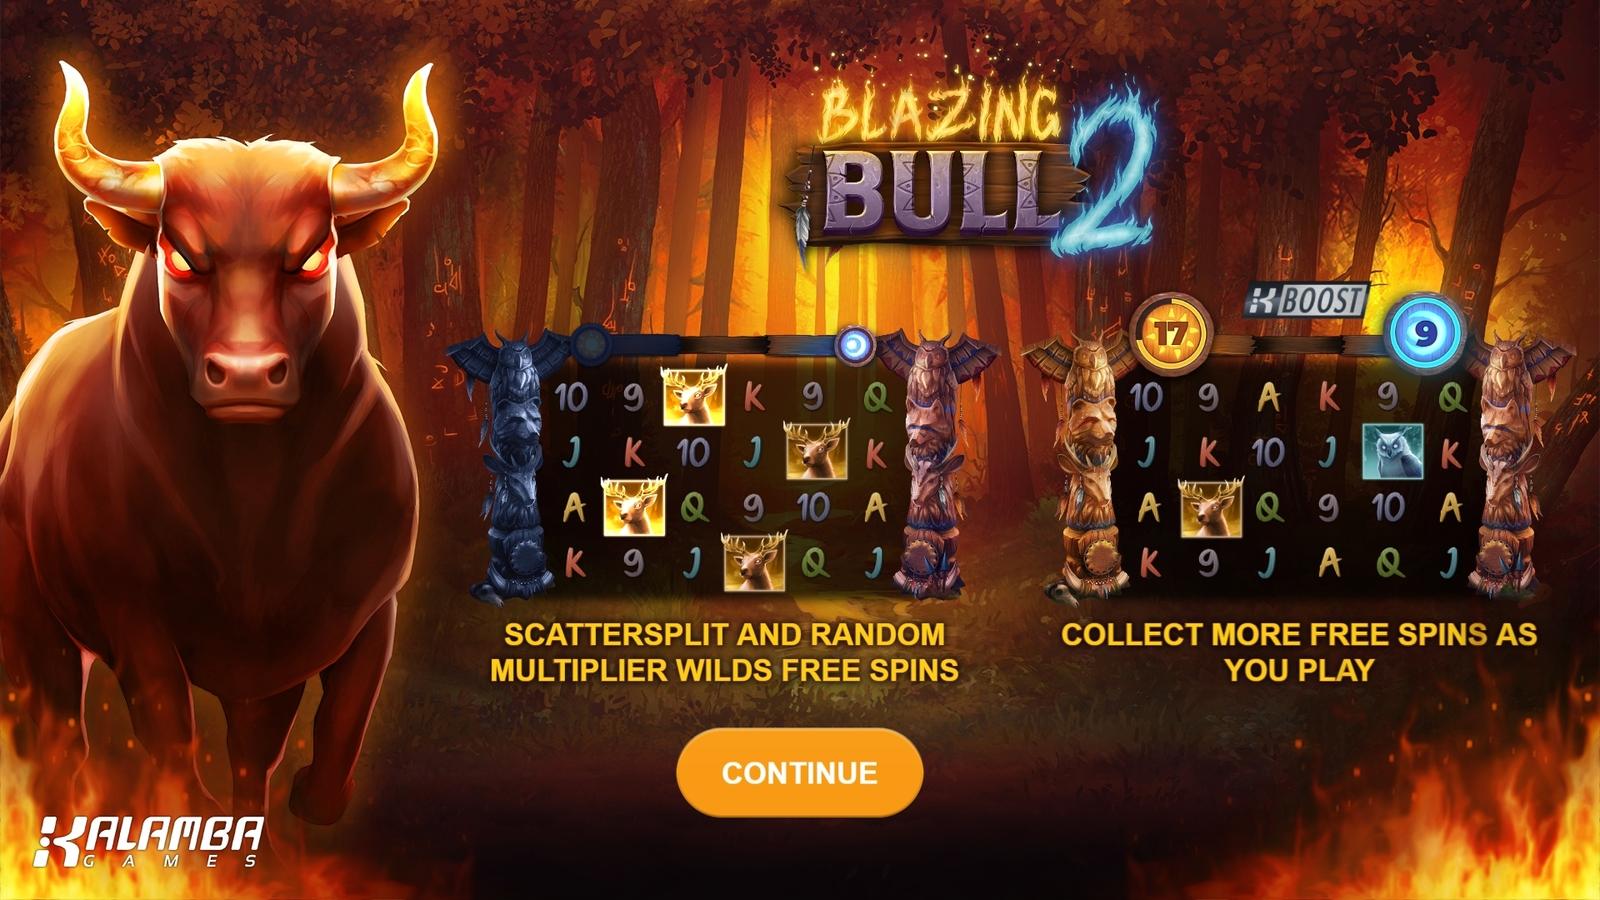 Blazing Bull 2 Screenshot